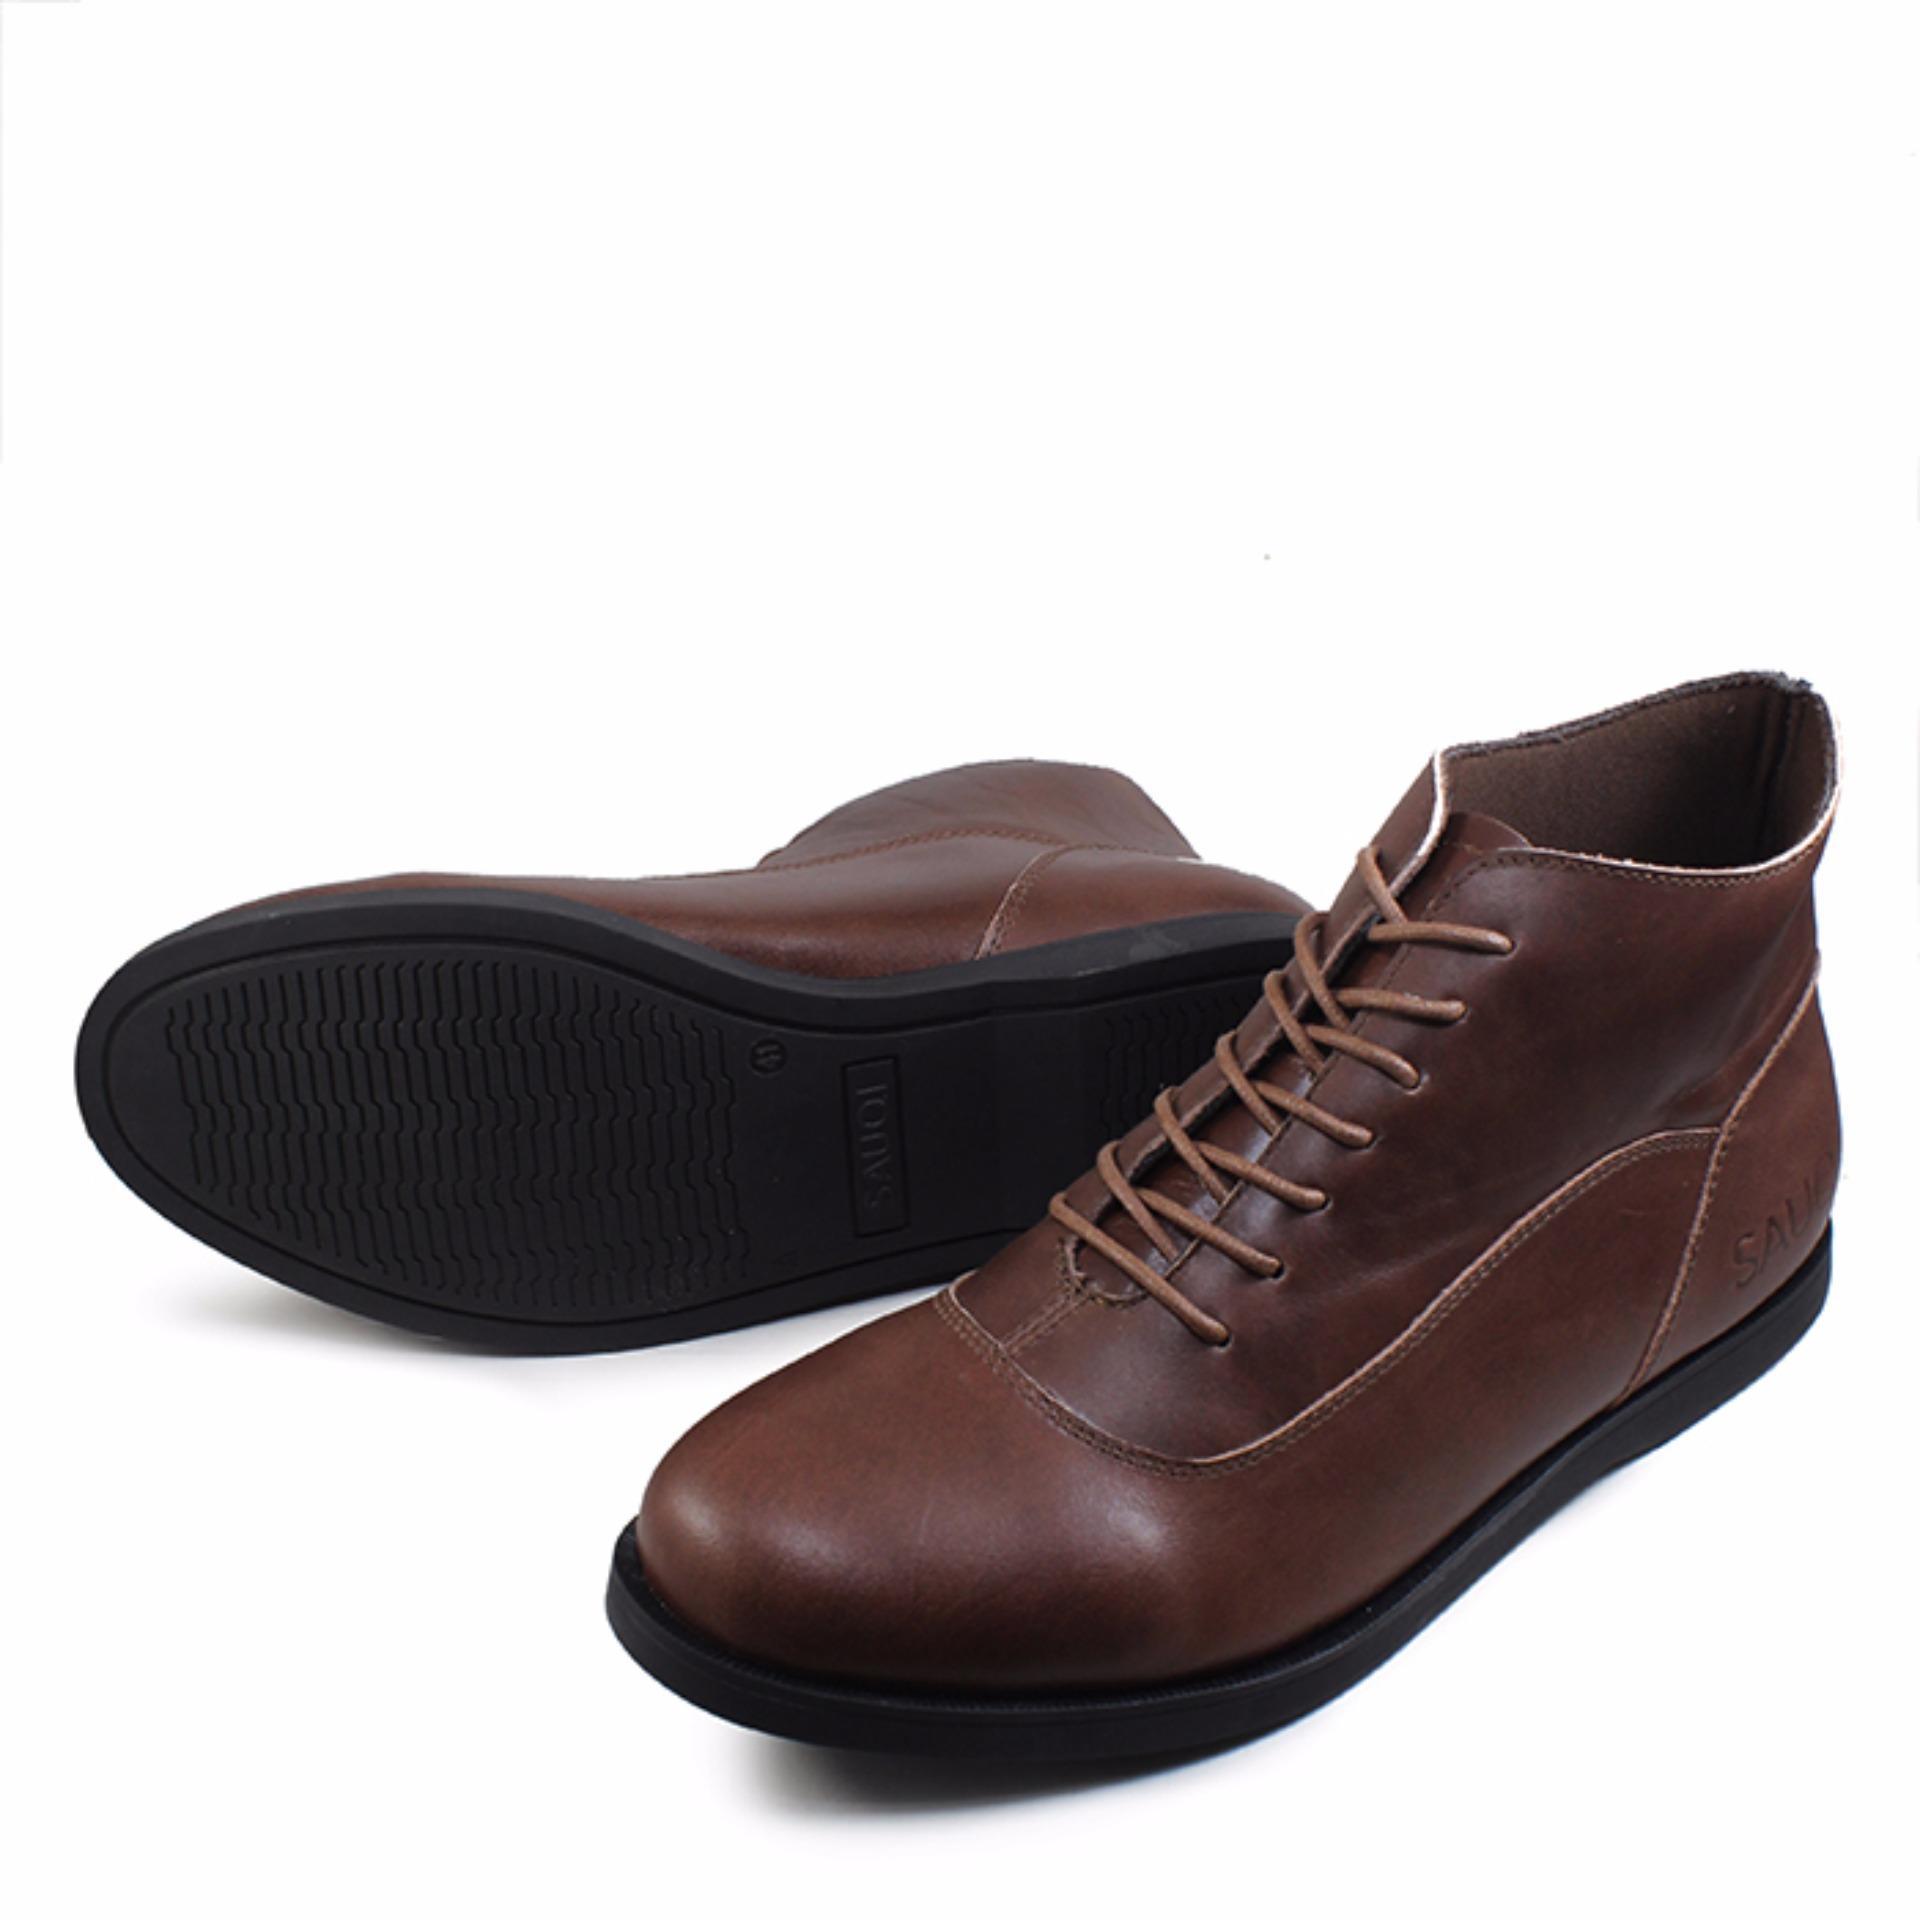 Sepatu Kasual Formal Pria Kulit Asli Toods Spectre Black Spec Dan Footwear Longwing Sauqi Boots Casual Kantor Brown